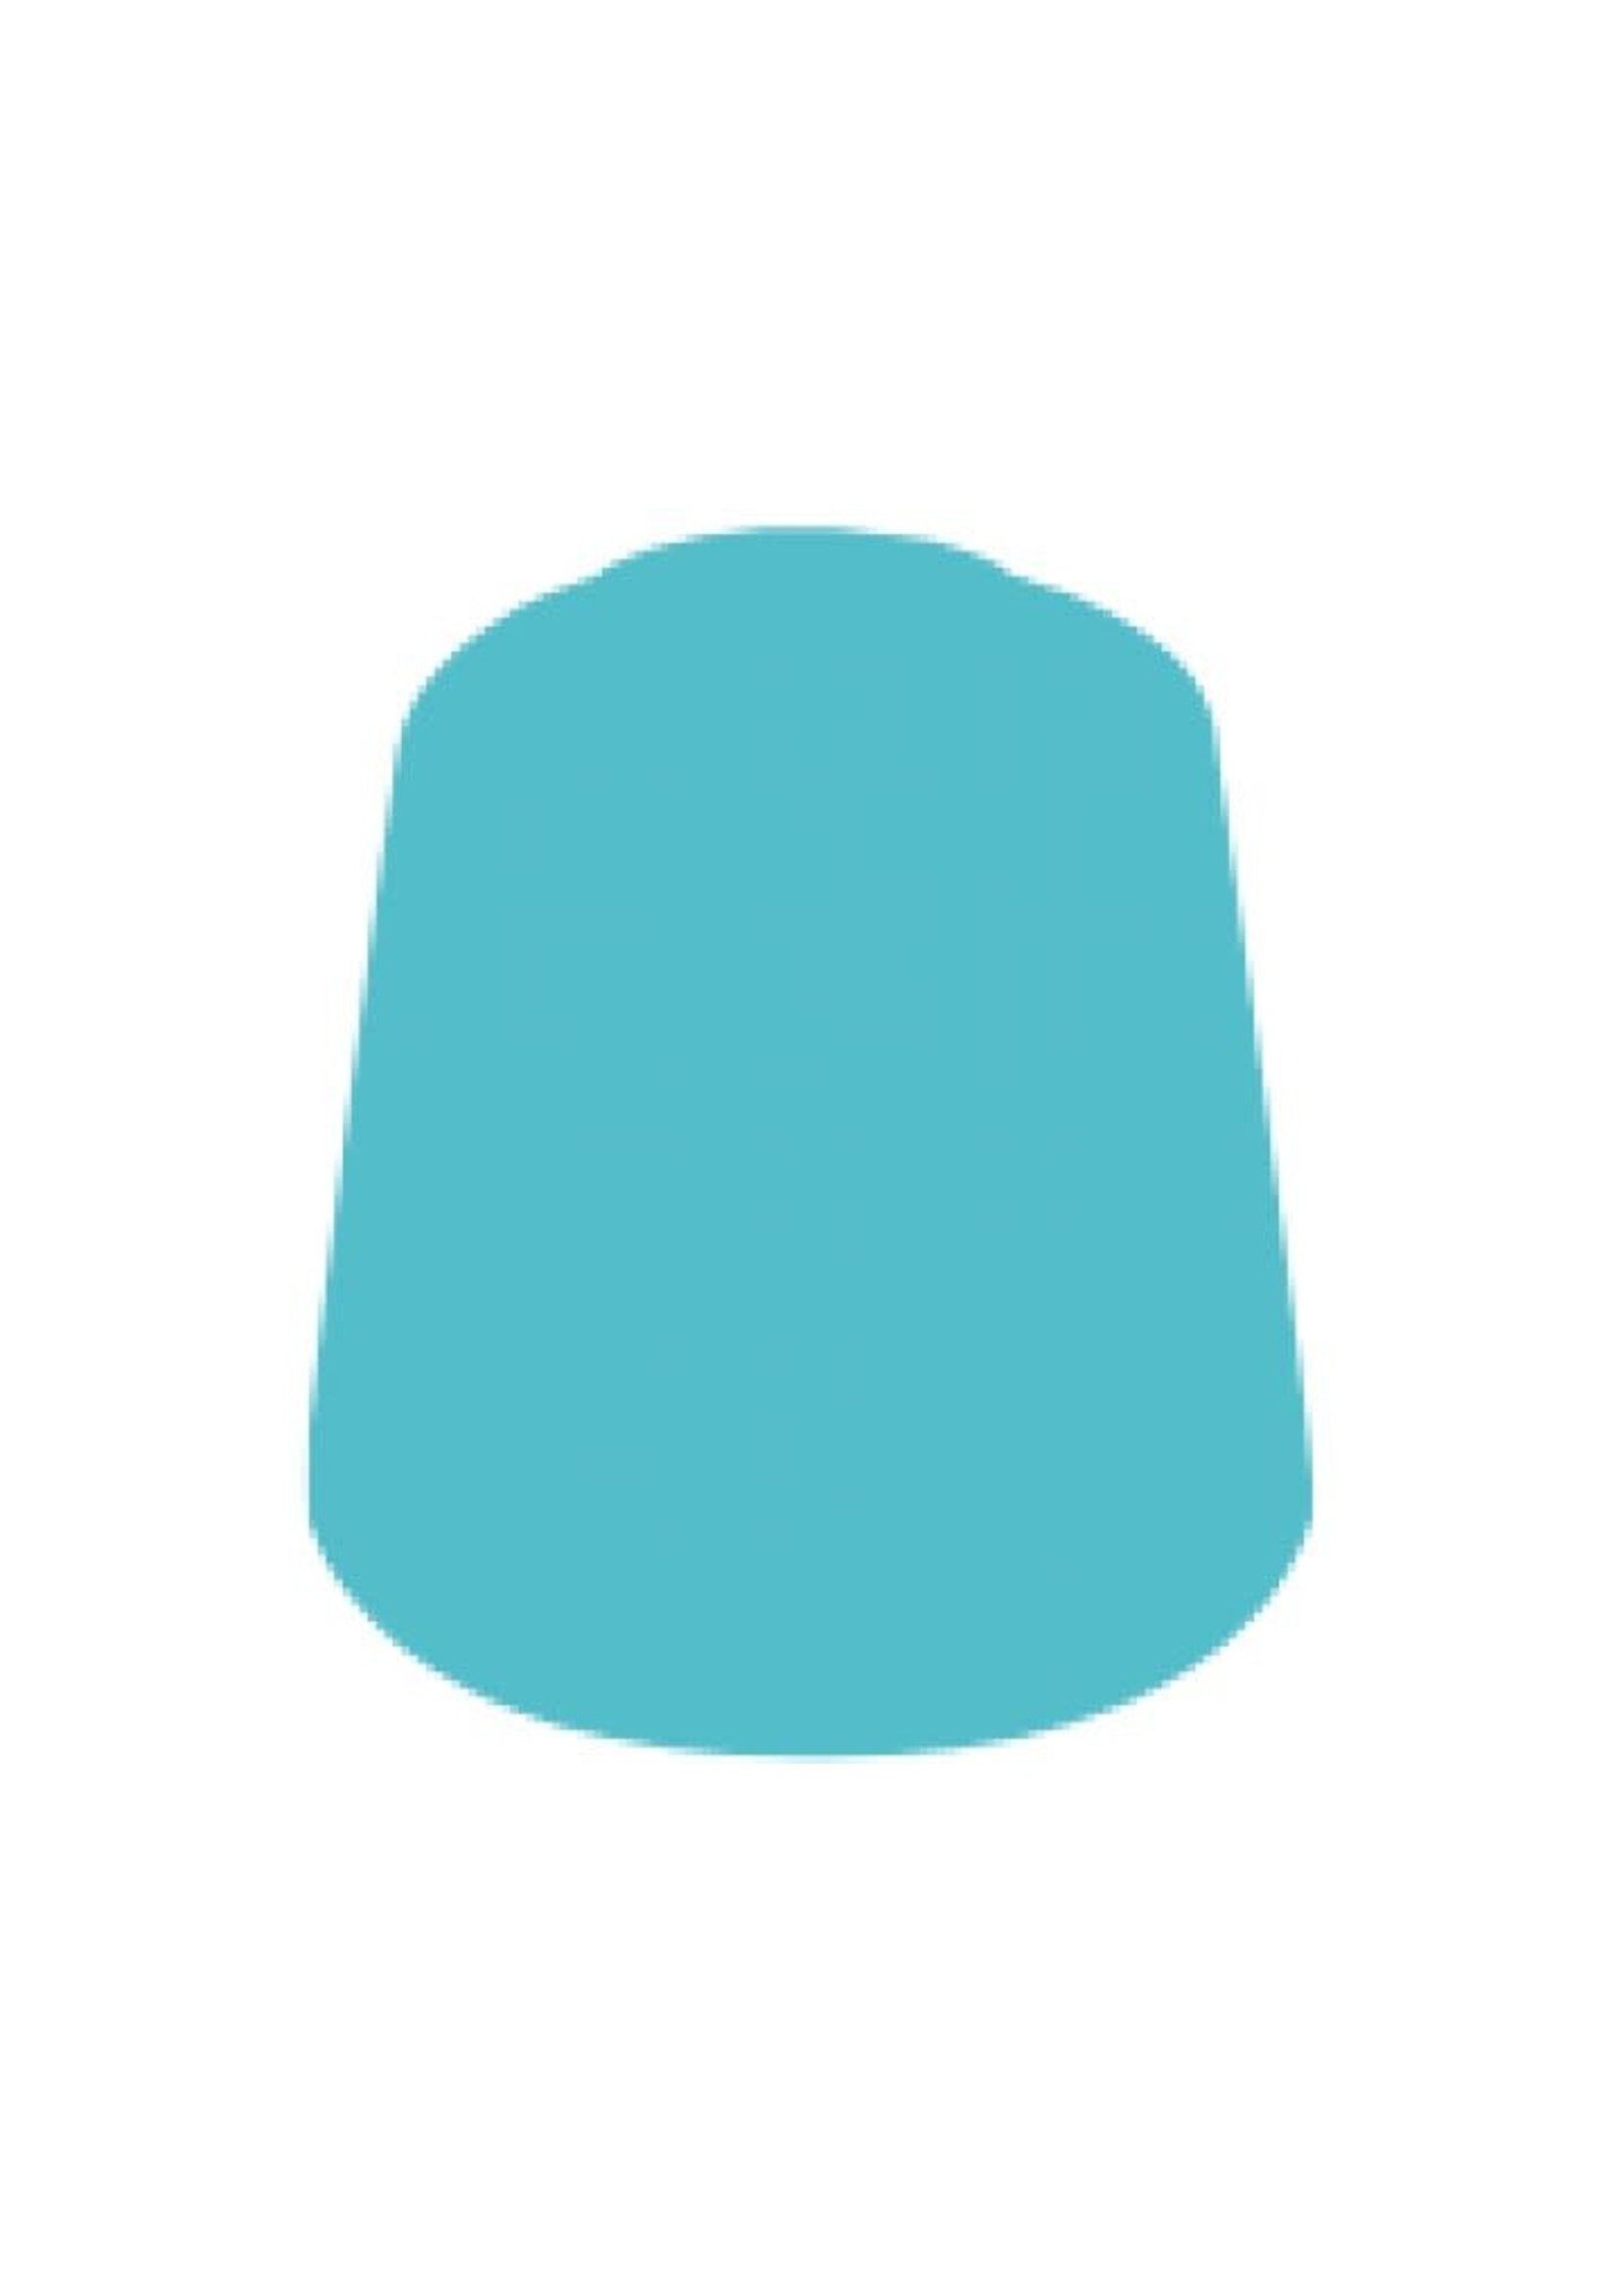 Layer: Baharroth Blue (12Ml)